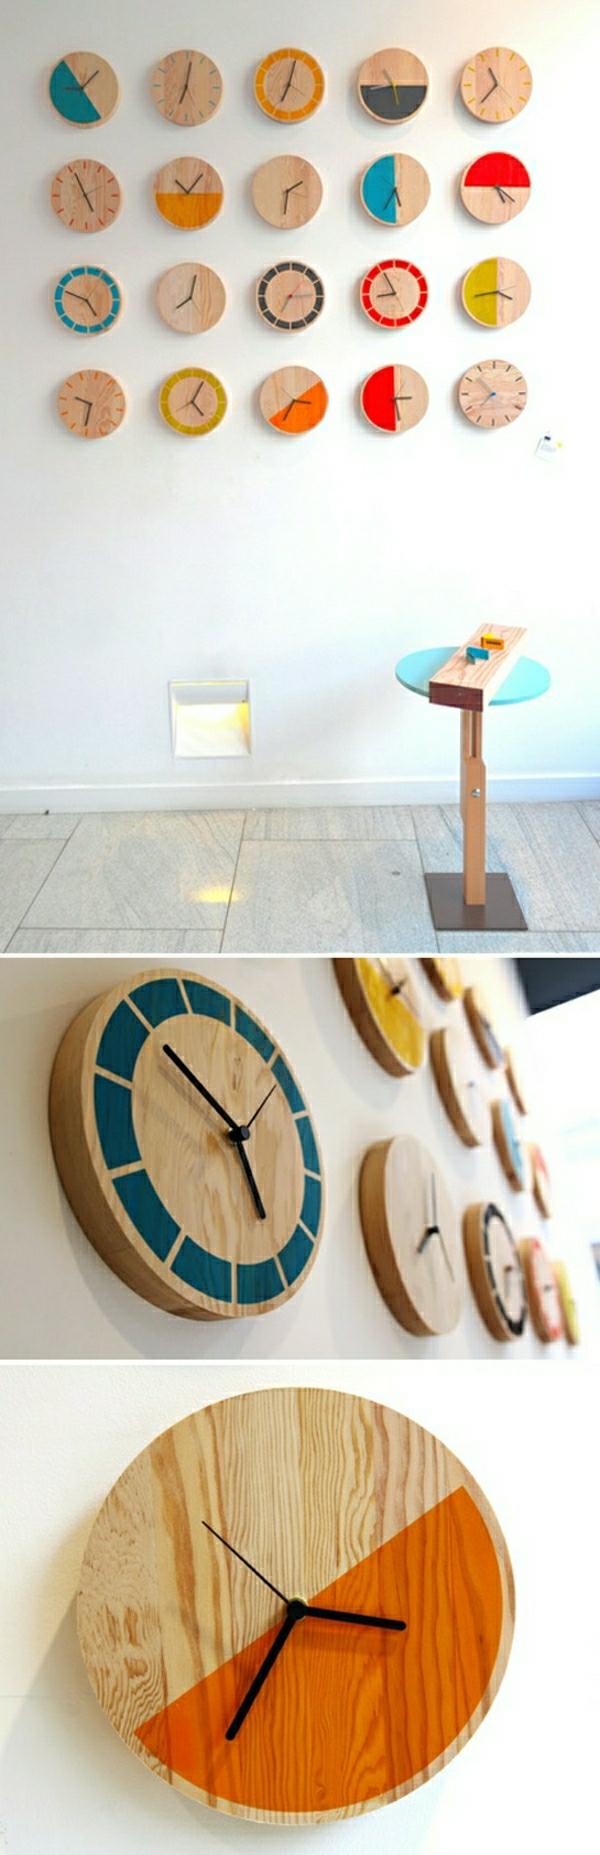 runde-Holzuhr-effektvolles-Design